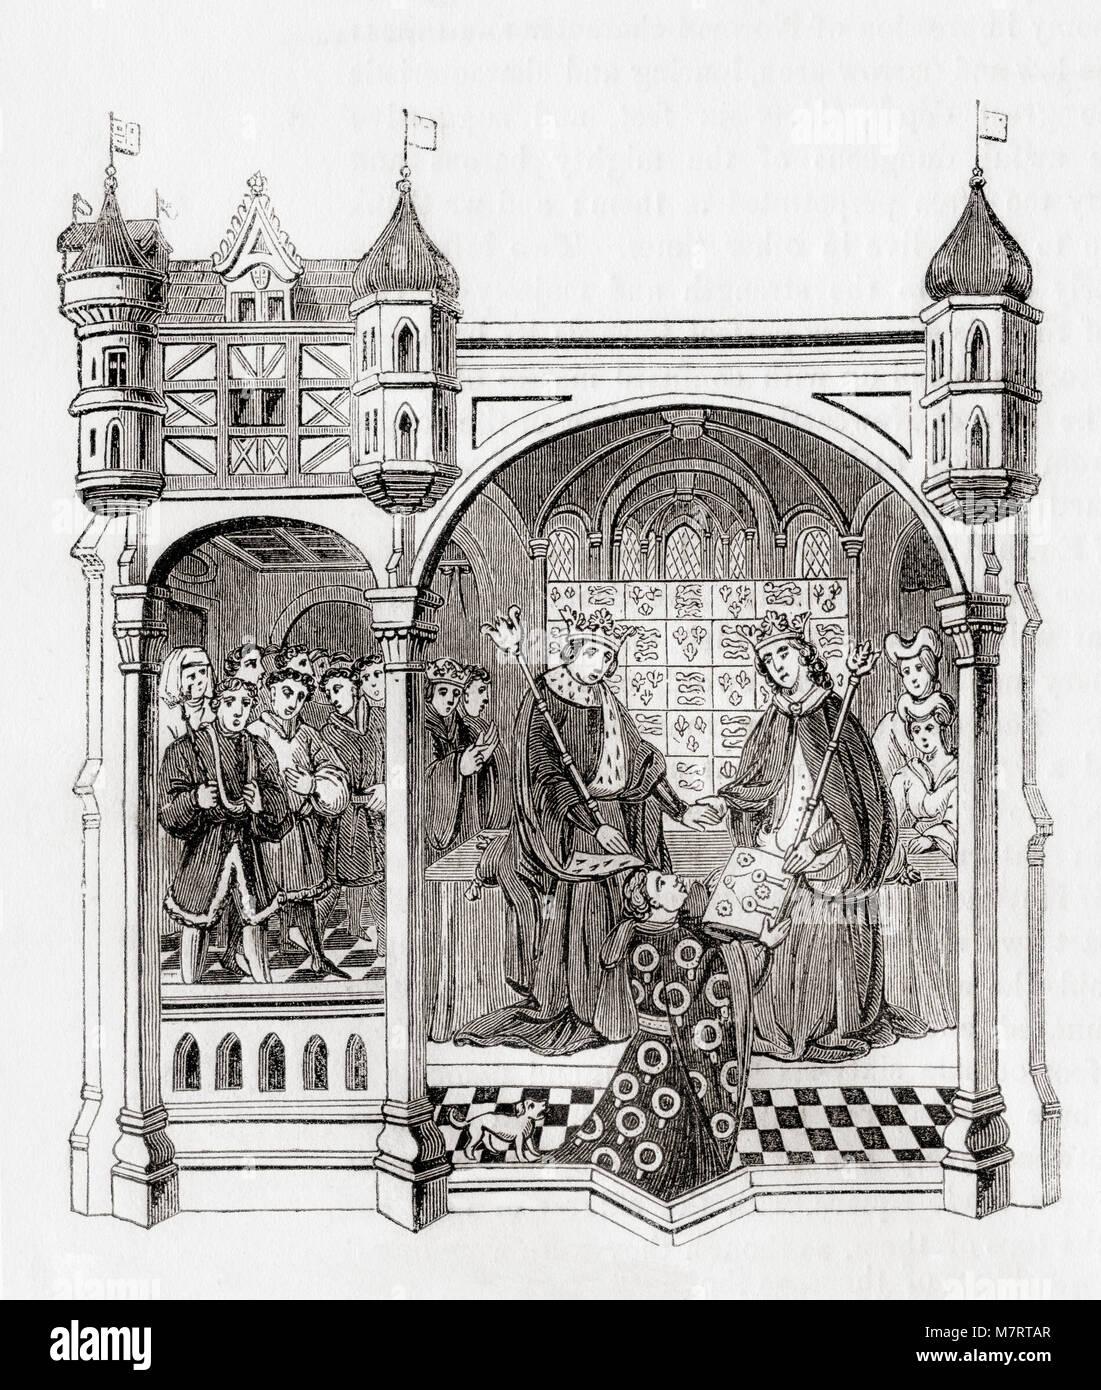 Talbot, with his dog, presenting the Talbot Shrewsbury Book to Margaret of Anjou and Henry VI, 1445.  John Talbot, Stock Photo